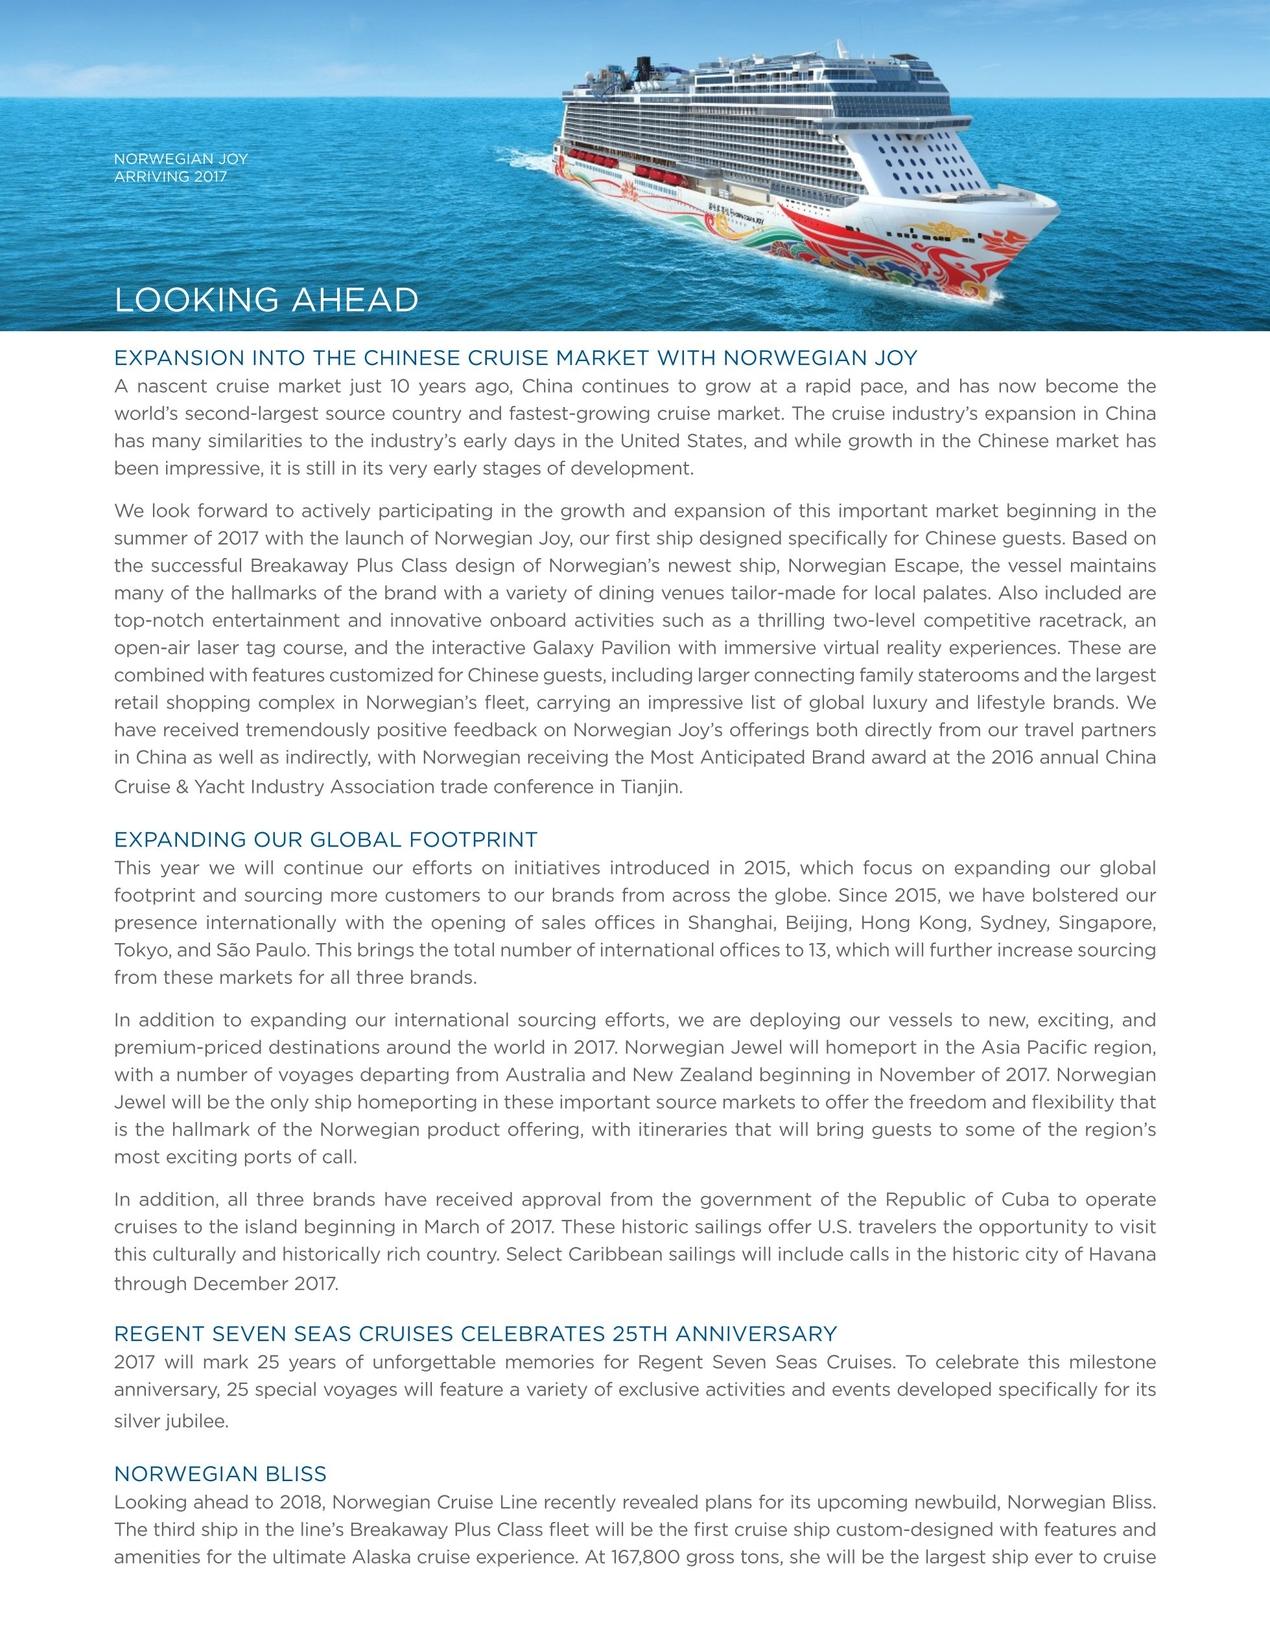 2016 Annual Report for Norwegian Cruiseline Holdings